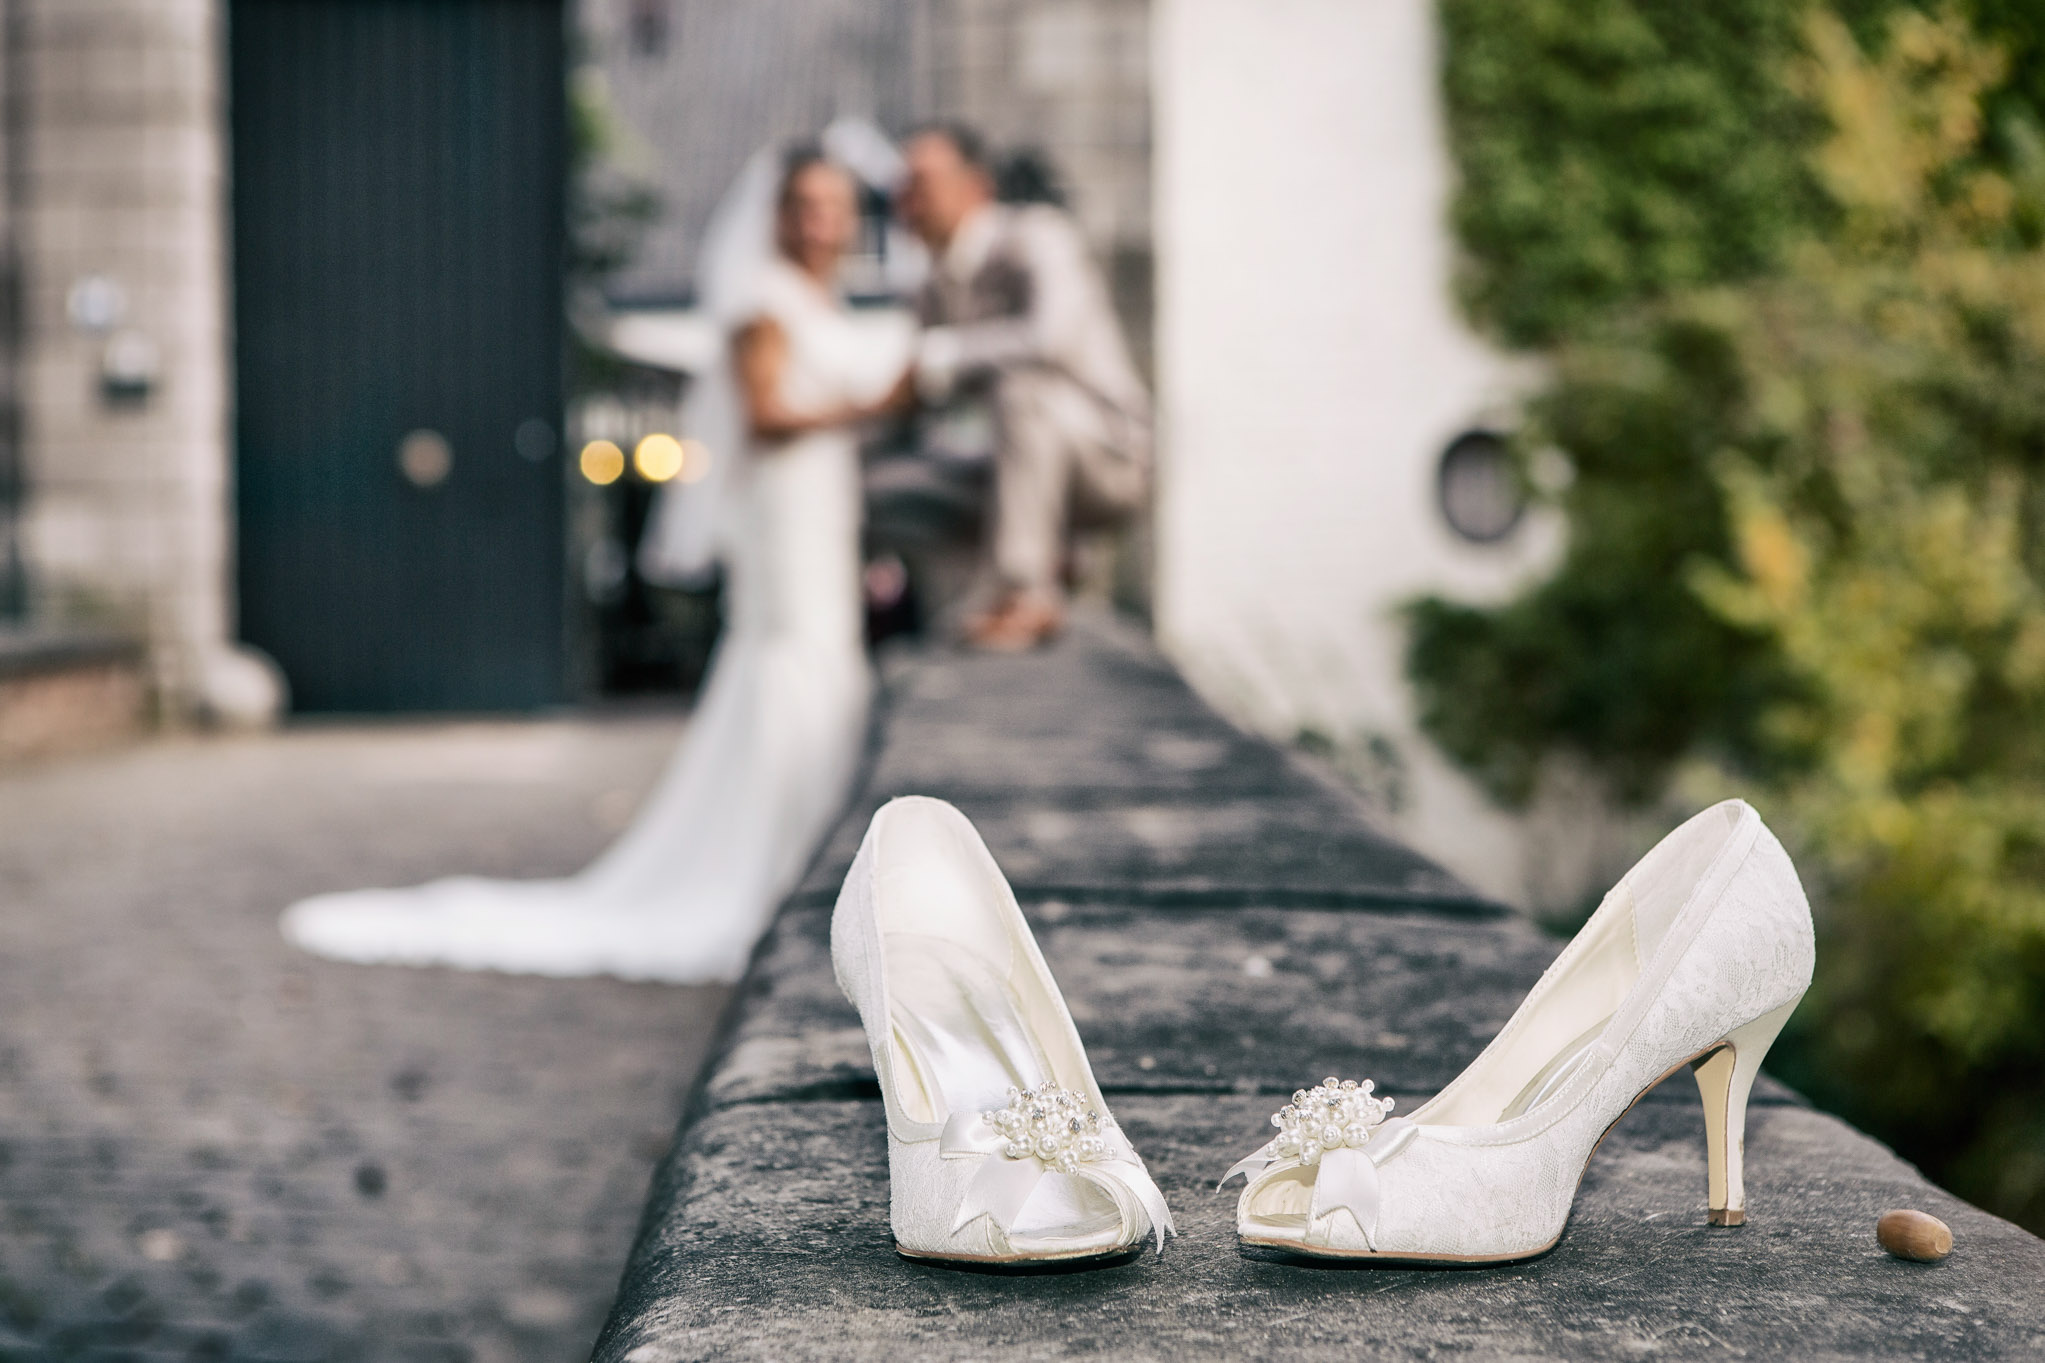 Trouwlocatie Limburg, Kasteel daelenbroeck, Herkenbosch, Trouwreportage, Bruidsschoenen foto, Sfeervolle foto, Hippe bruidsfoto